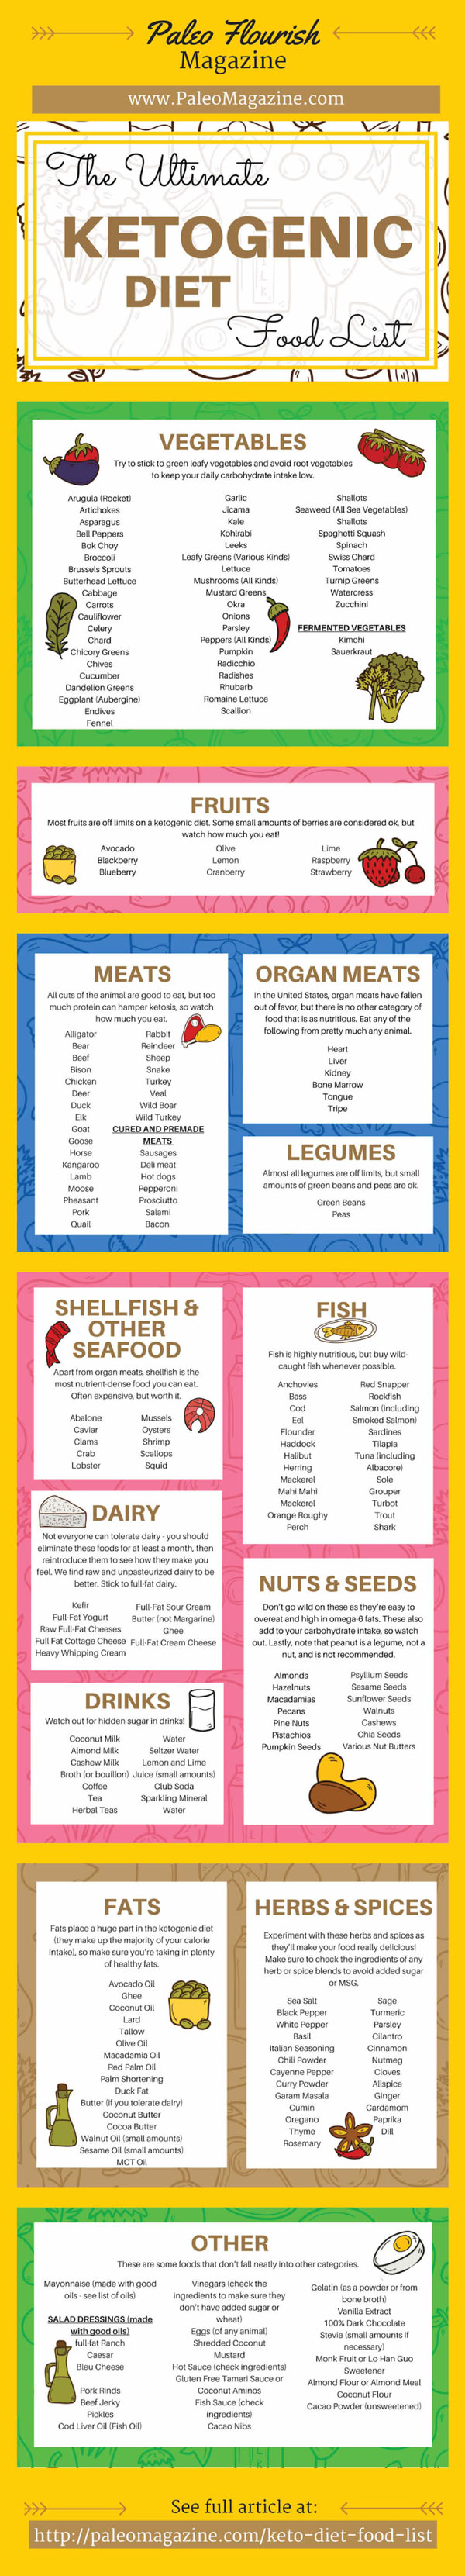 keto-diet-food-list